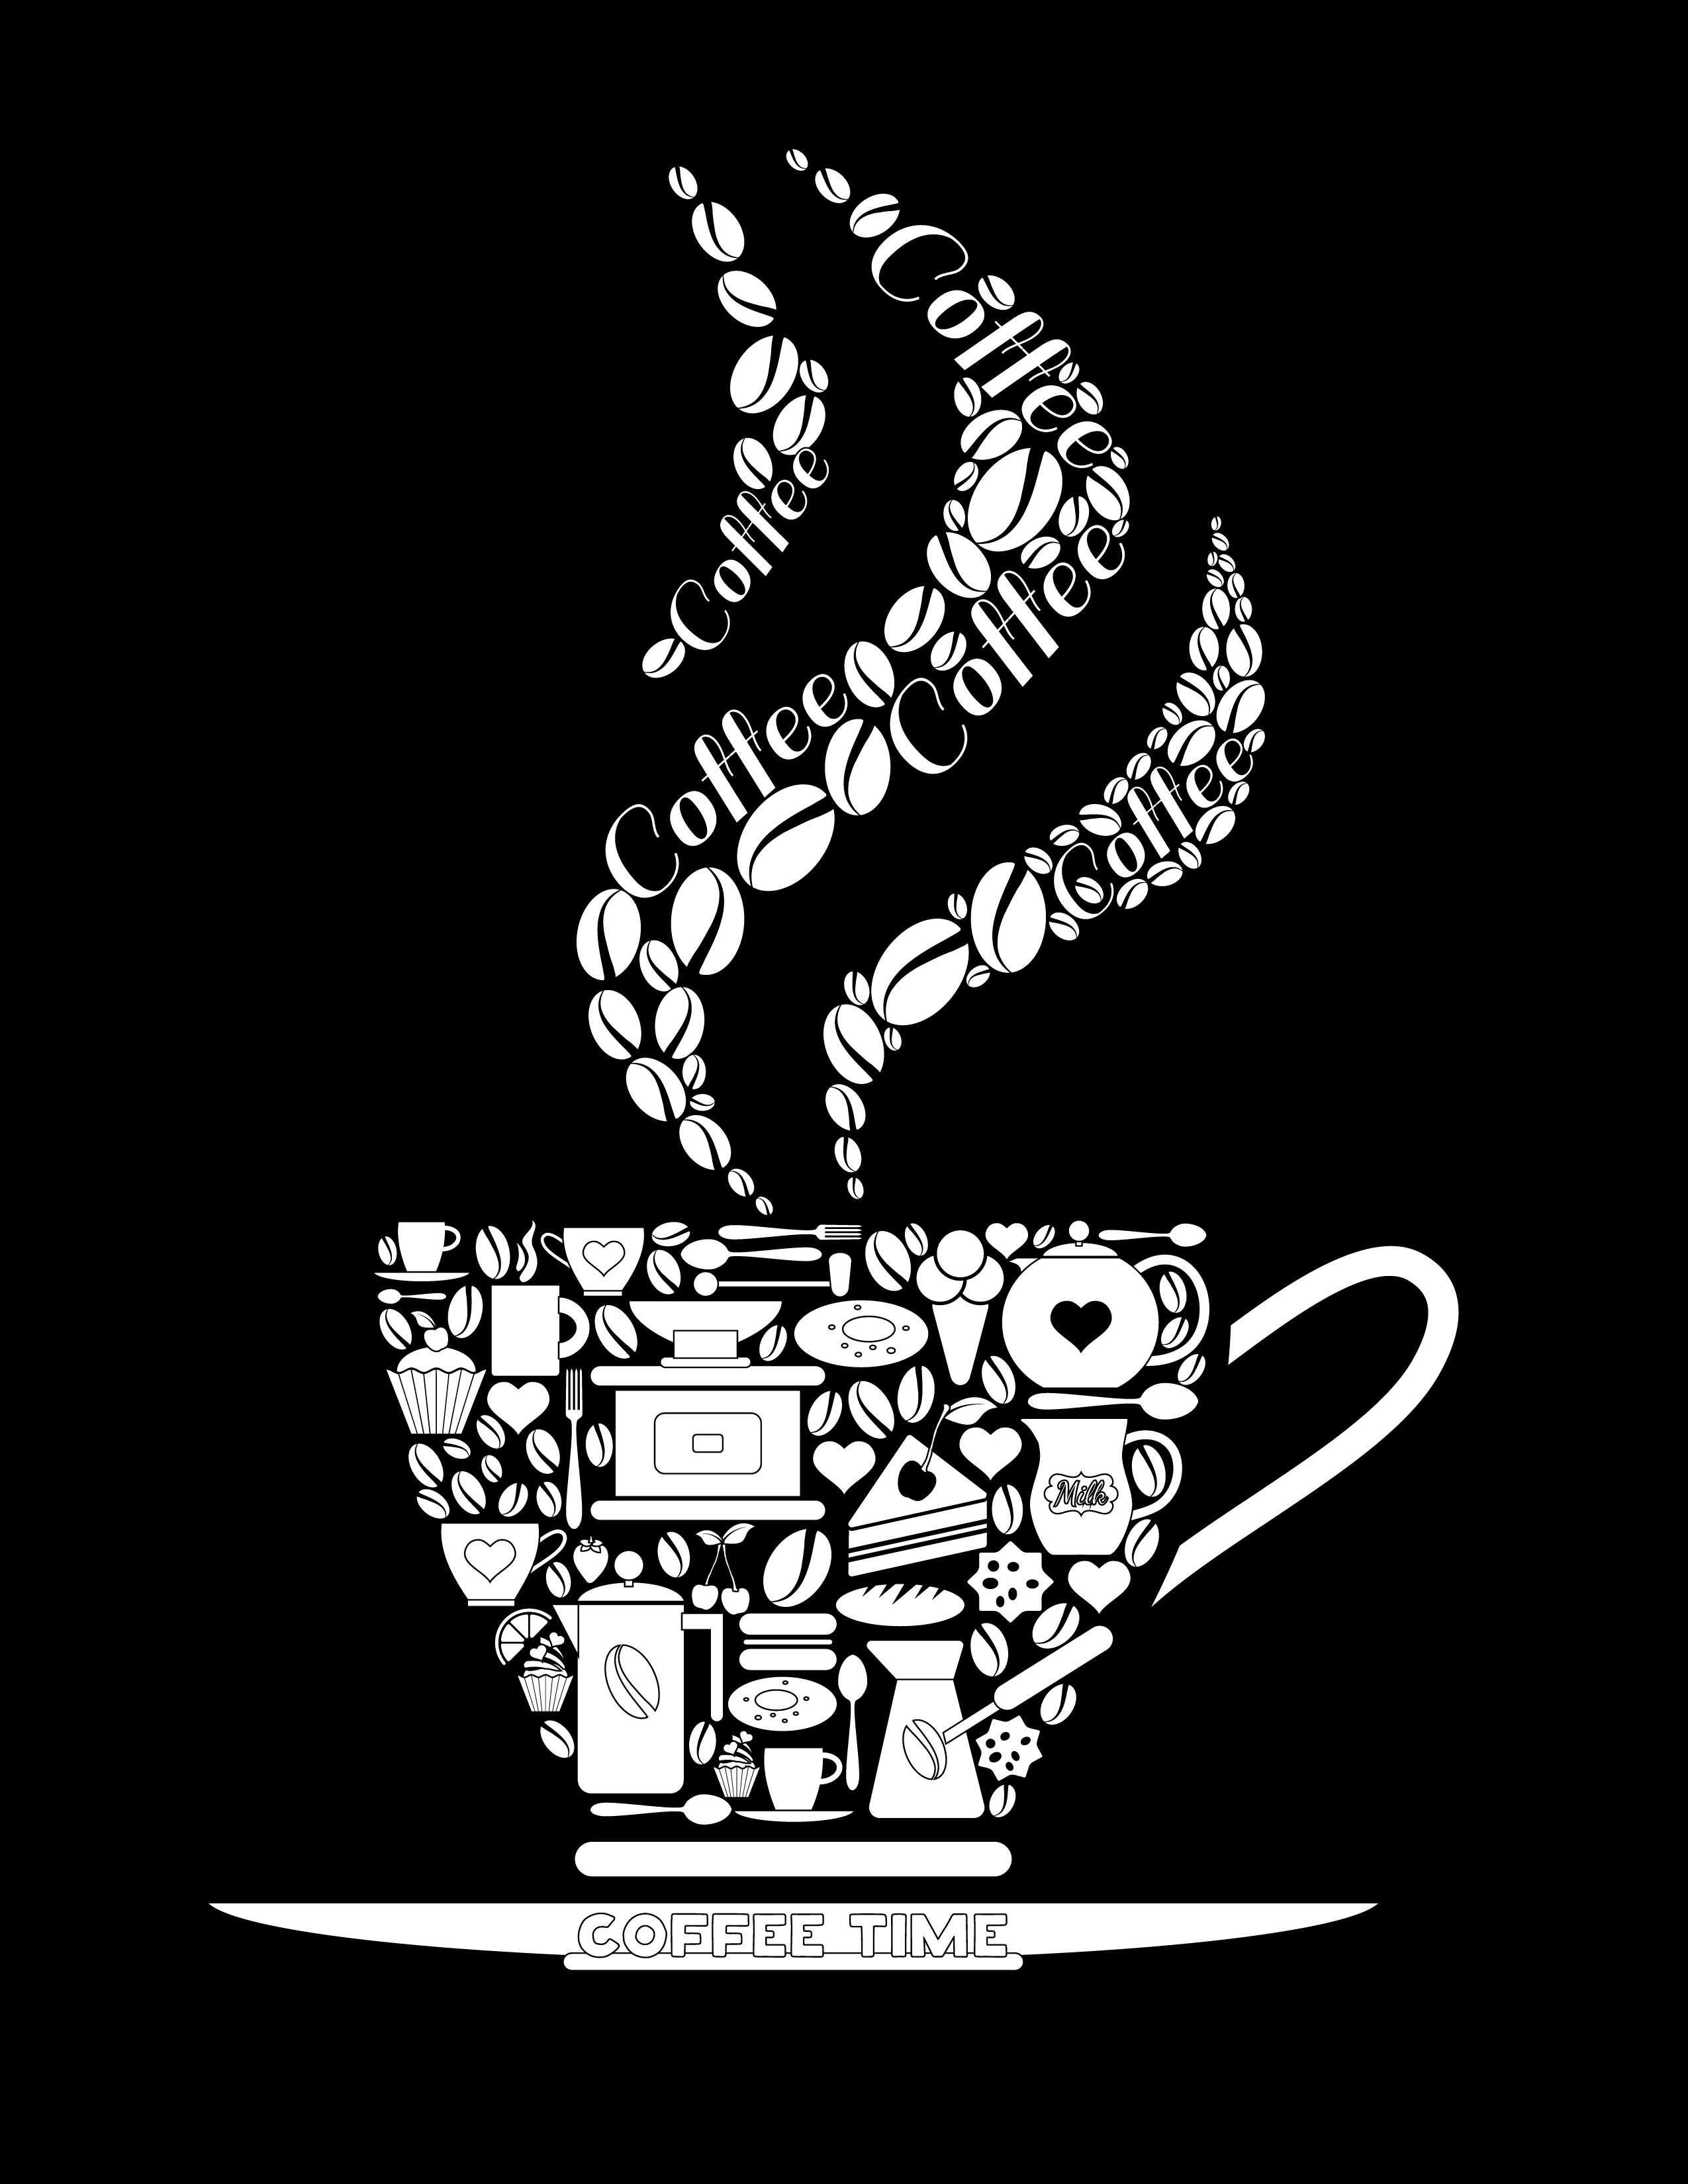 coloriage noir image tasse de caf imprimer coloriage de nuit black background coloring page. Black Bedroom Furniture Sets. Home Design Ideas